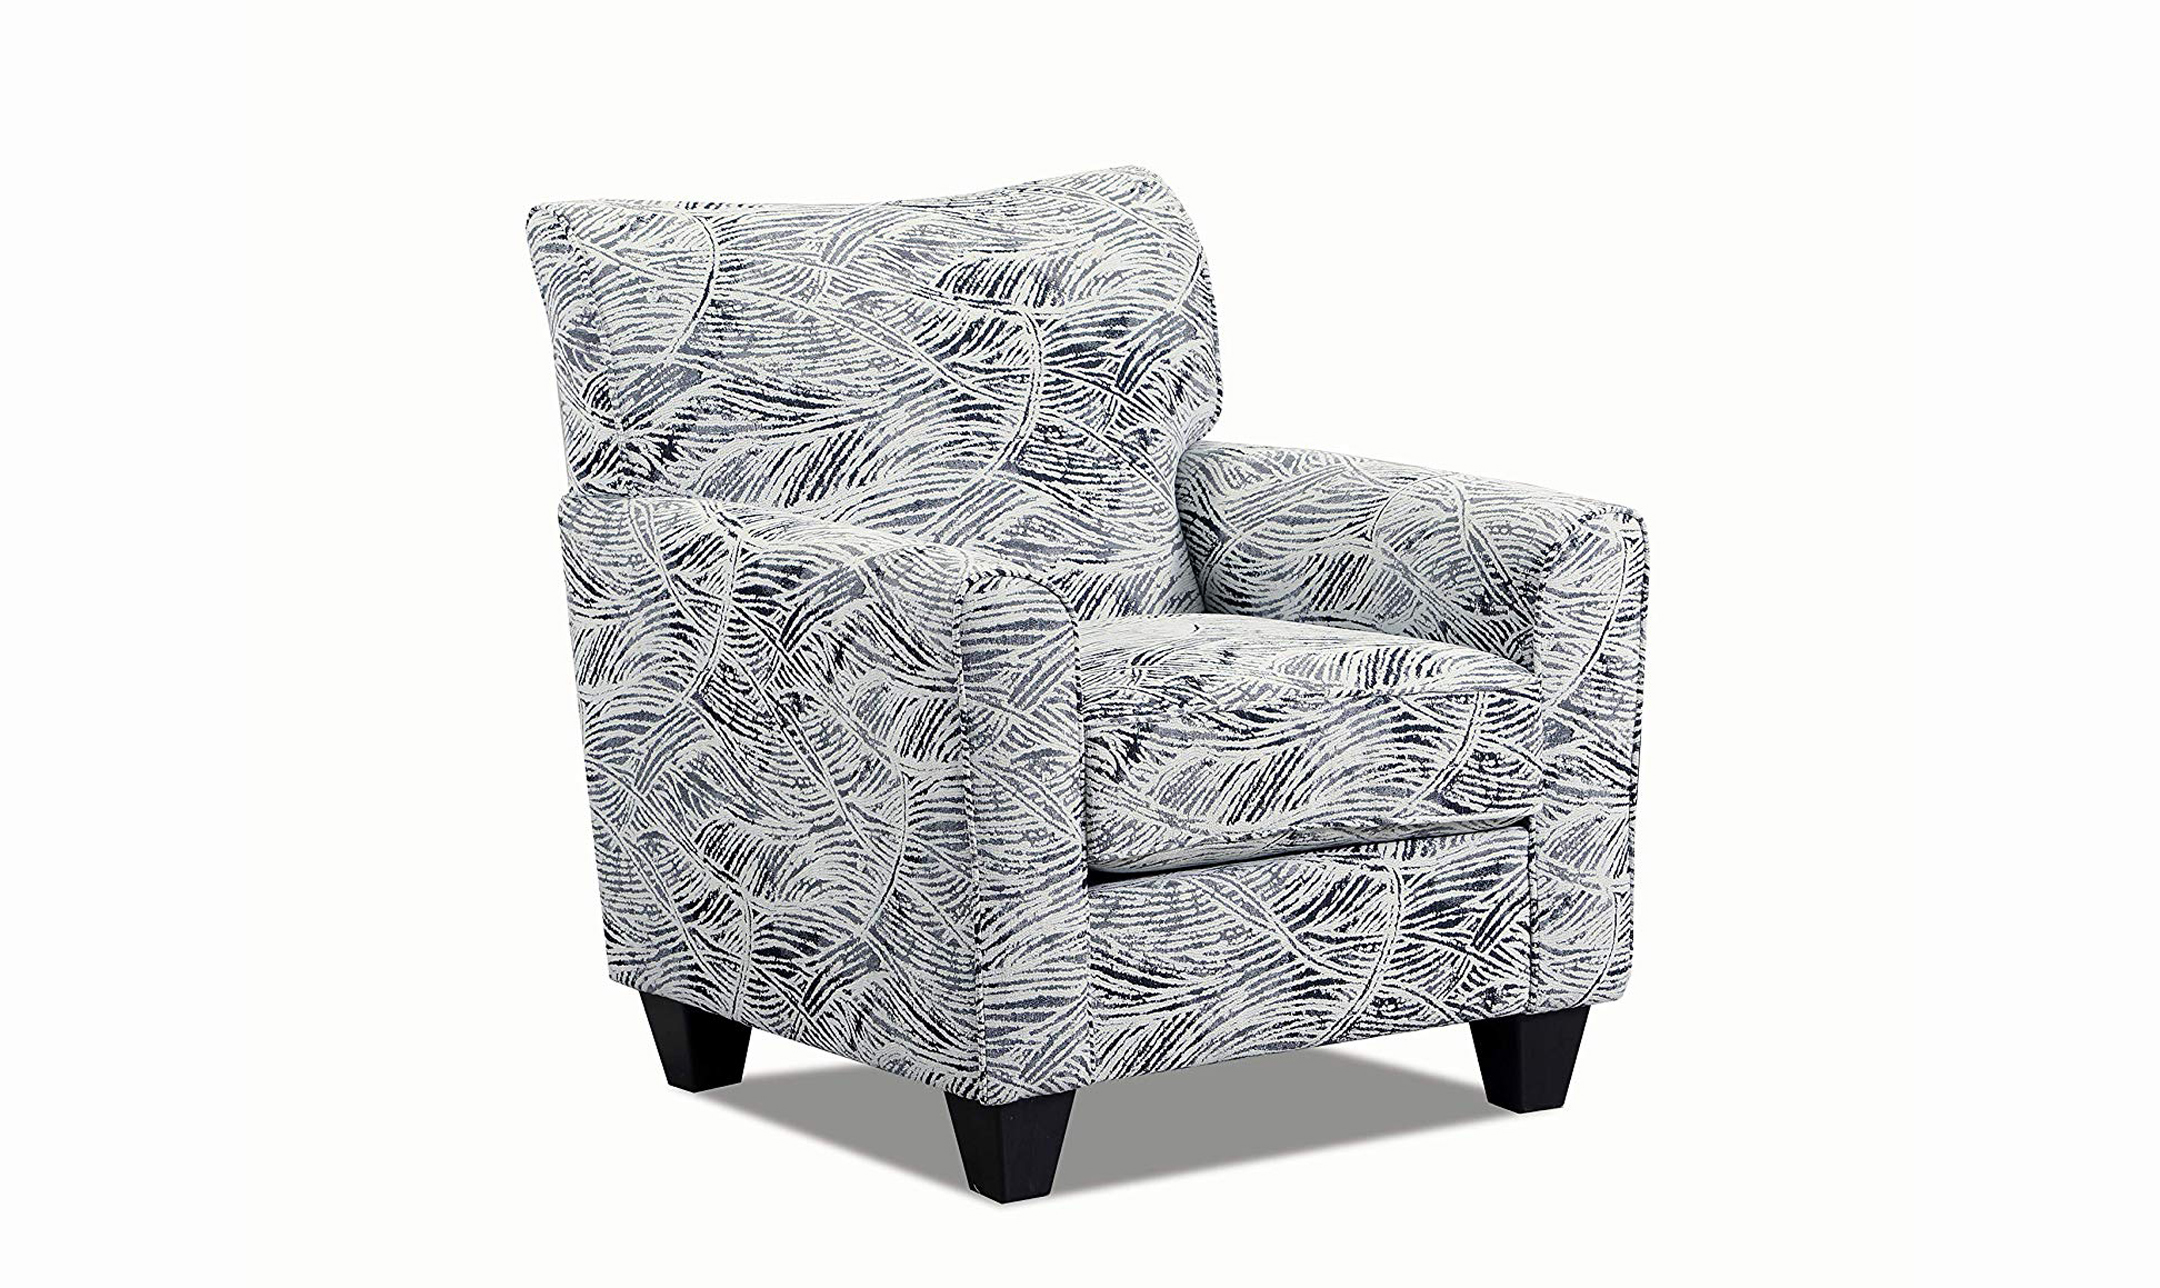 UN158BO Bizzar Onyx (Acc chair) 2